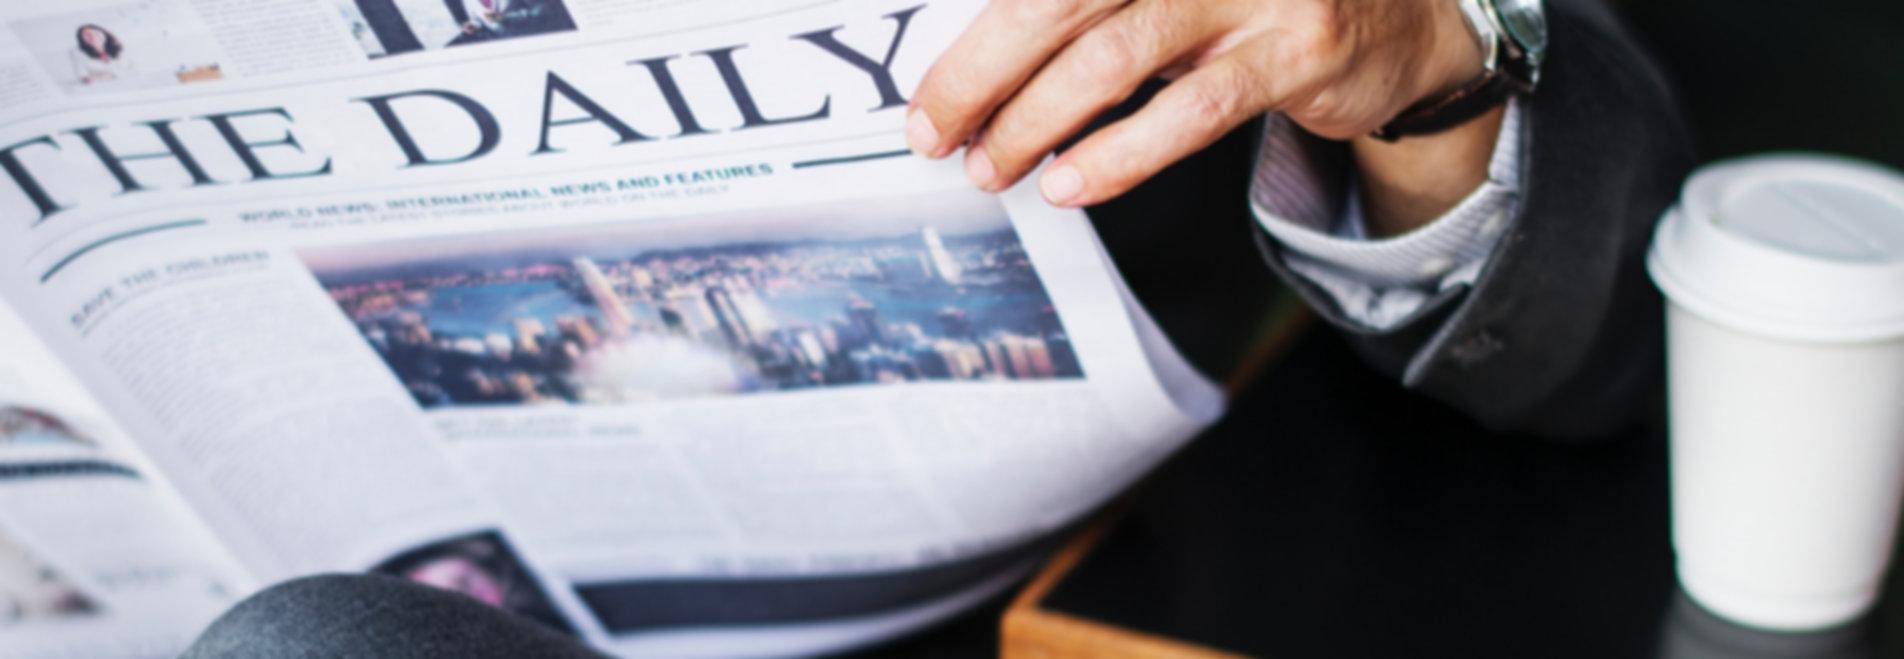 Reading%2520a%2520Newspaper_edited_edite